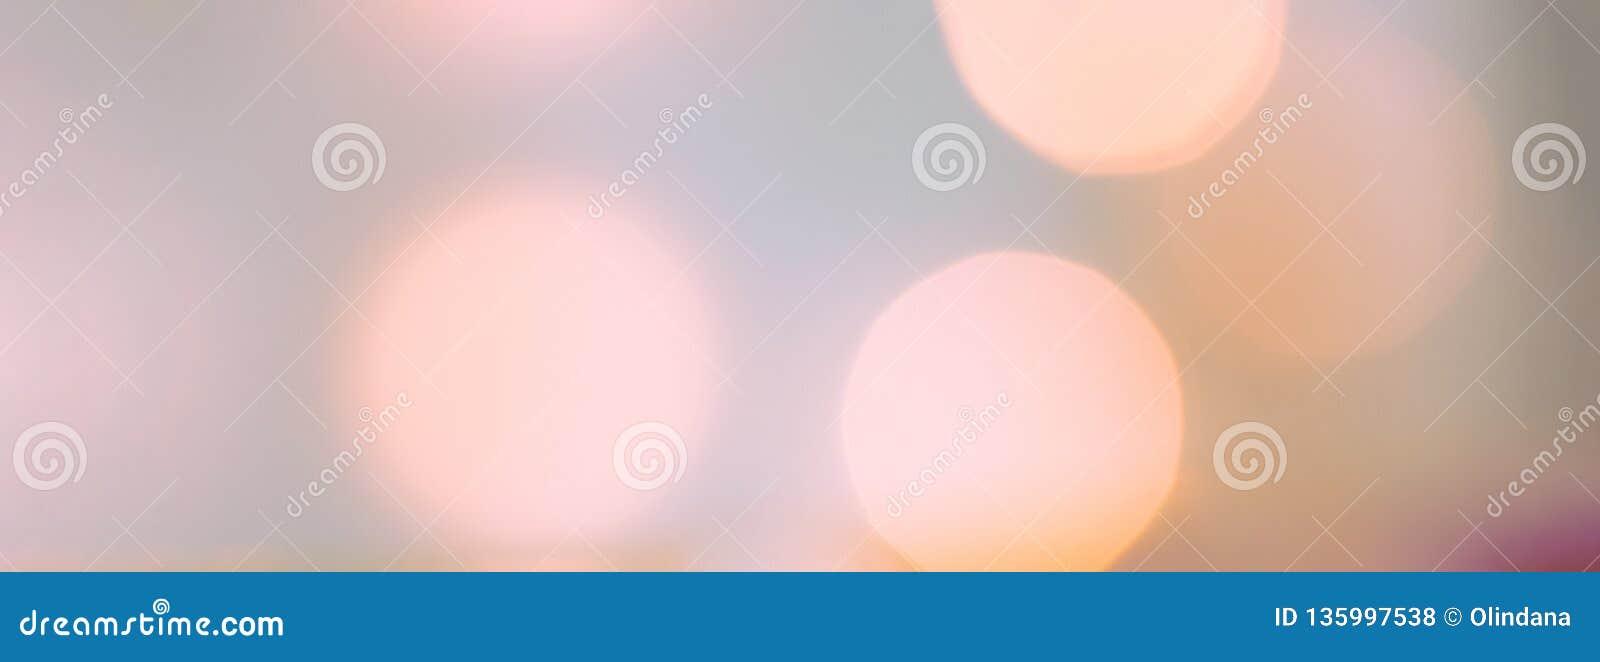 Beautiful elegant pastel multicolor color holiday background for Christmas New Year Birthday Valentine celebration